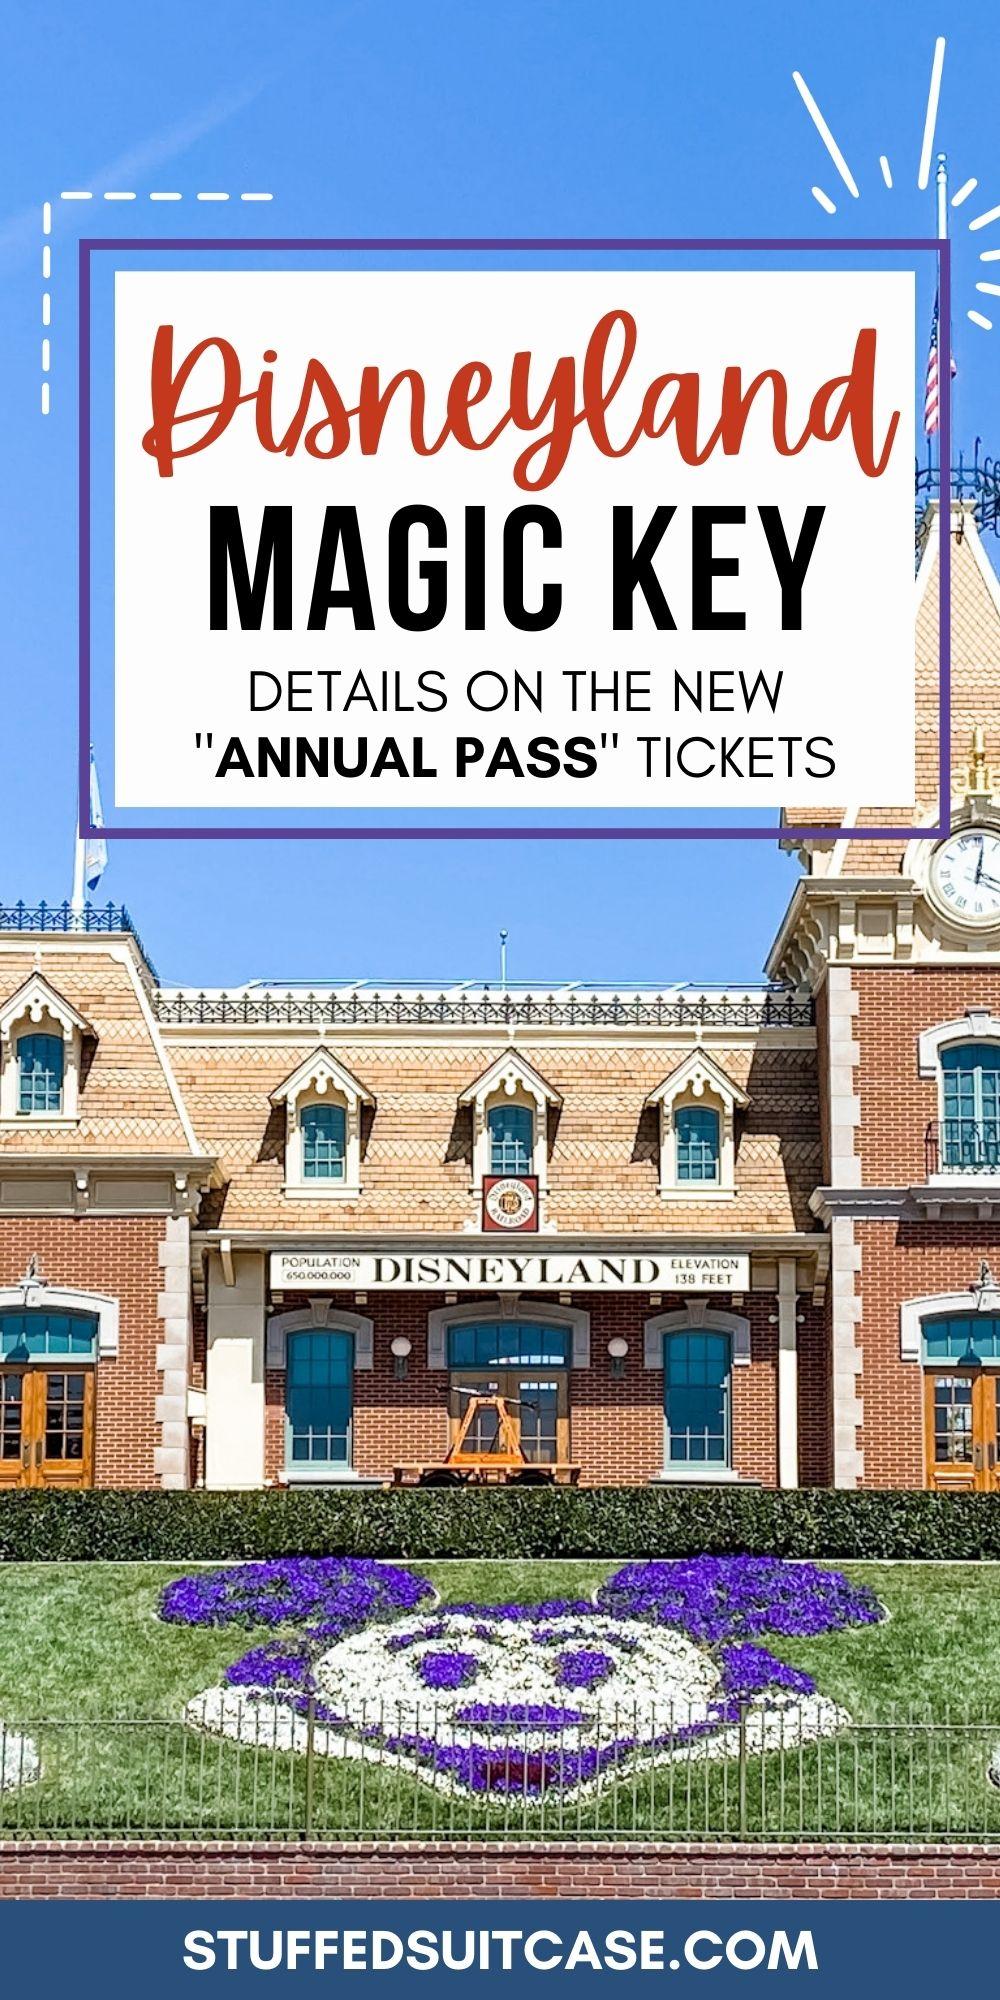 disneyland magic key new annual pass text overlay box on photo of disneyland entrance